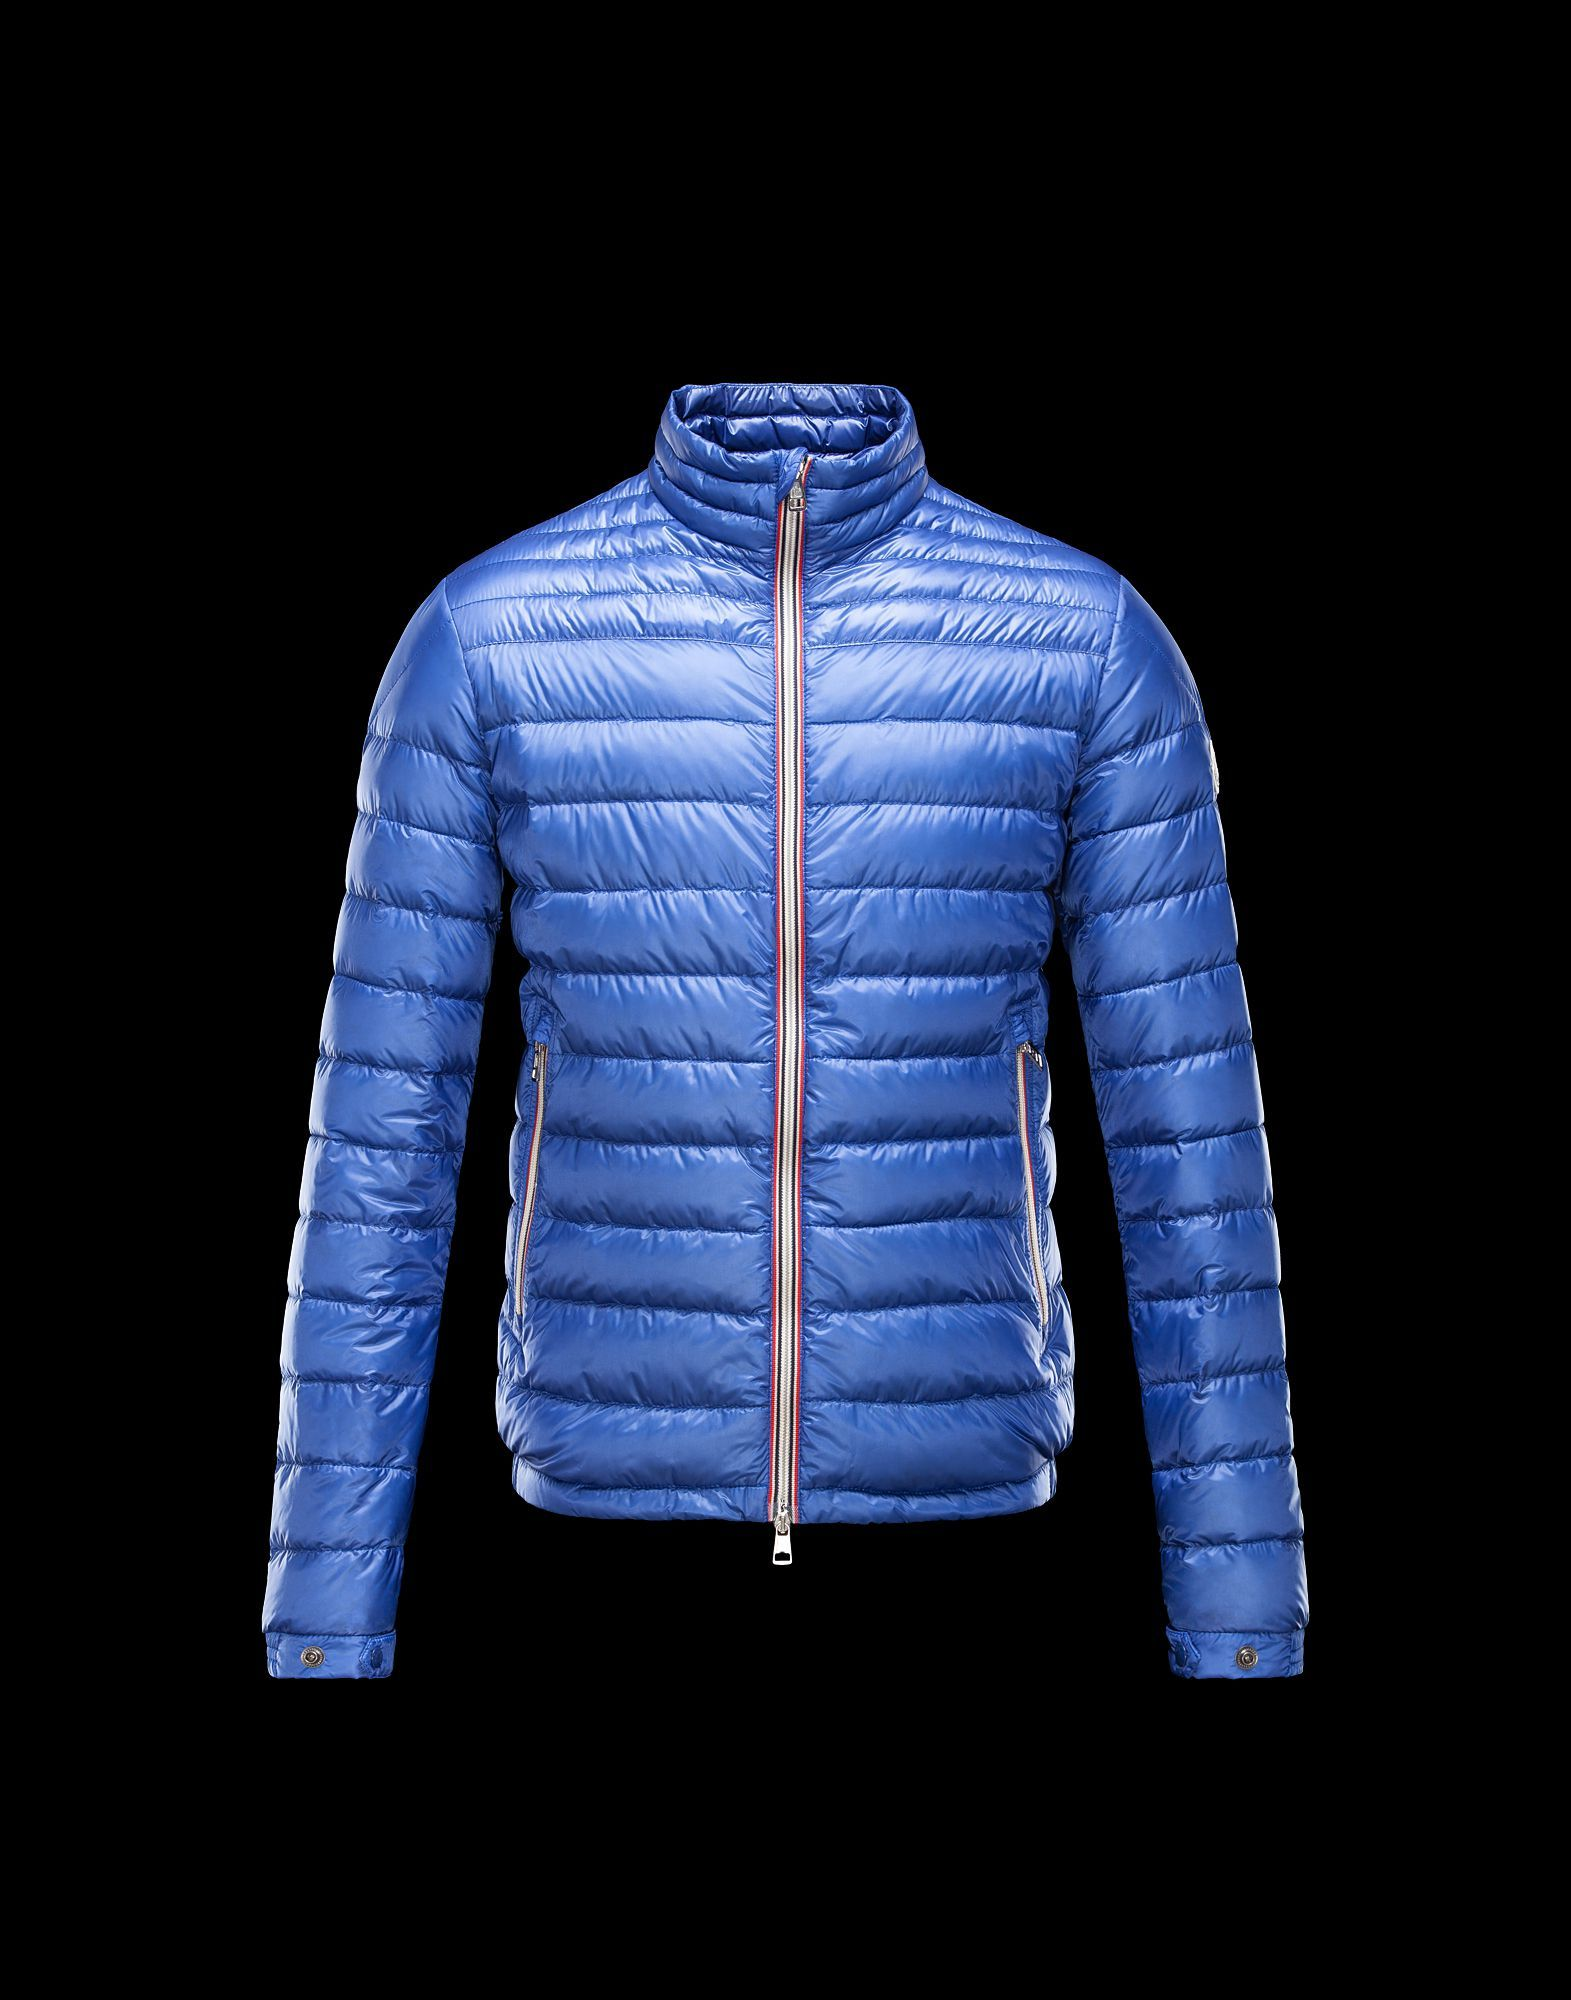 1fac11743 Jacket Men - Outerwear Men on Moncler Online Store